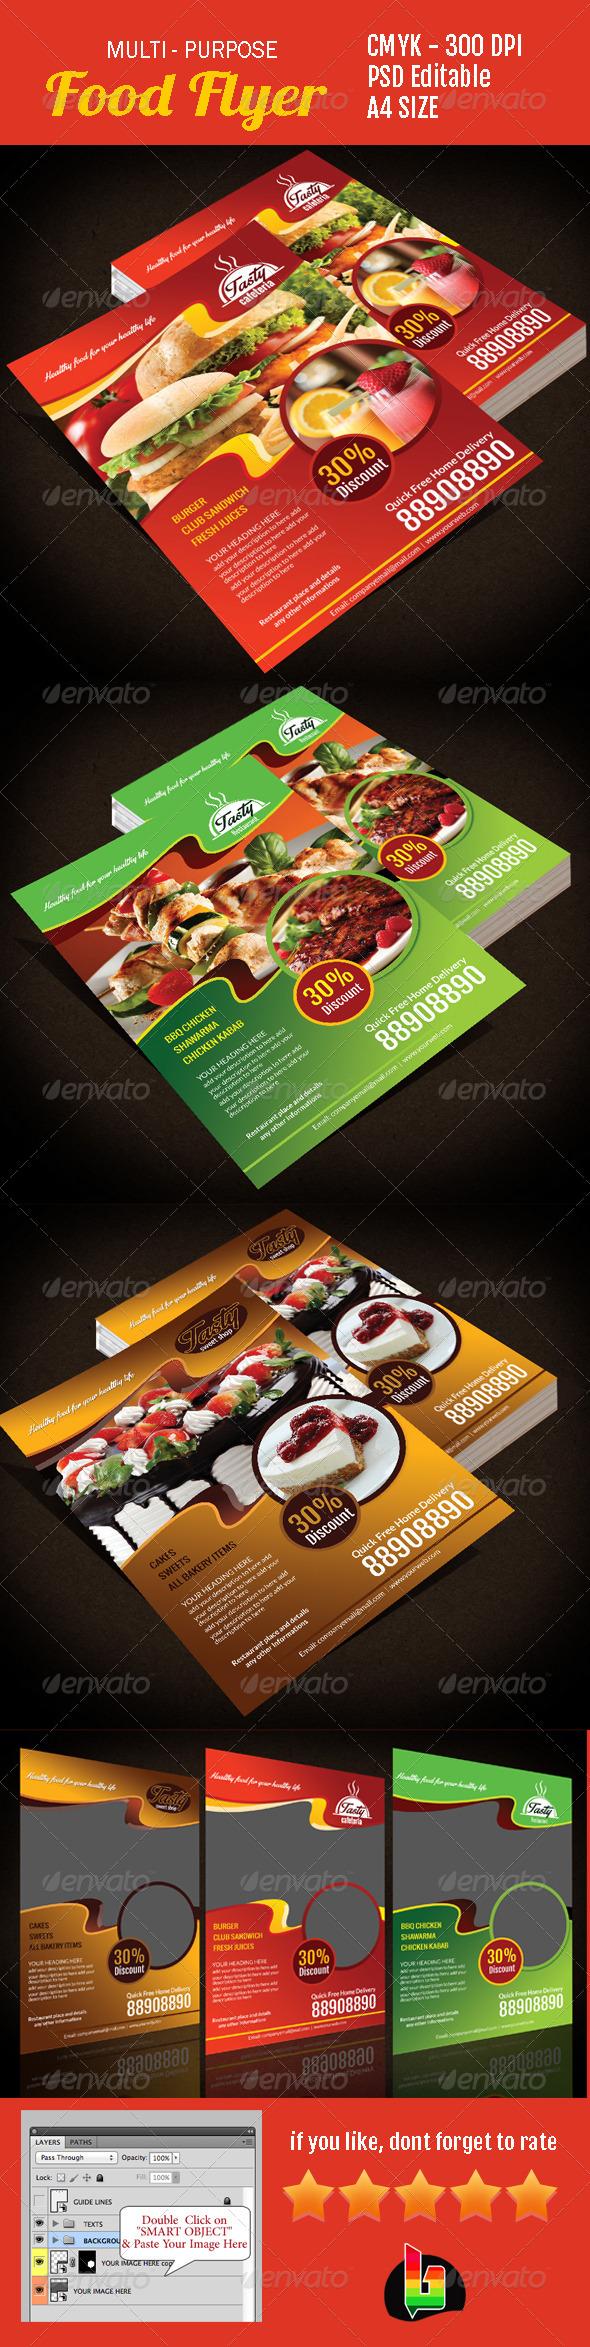 Multi-Purpose Food Flyer - Restaurant Flyers